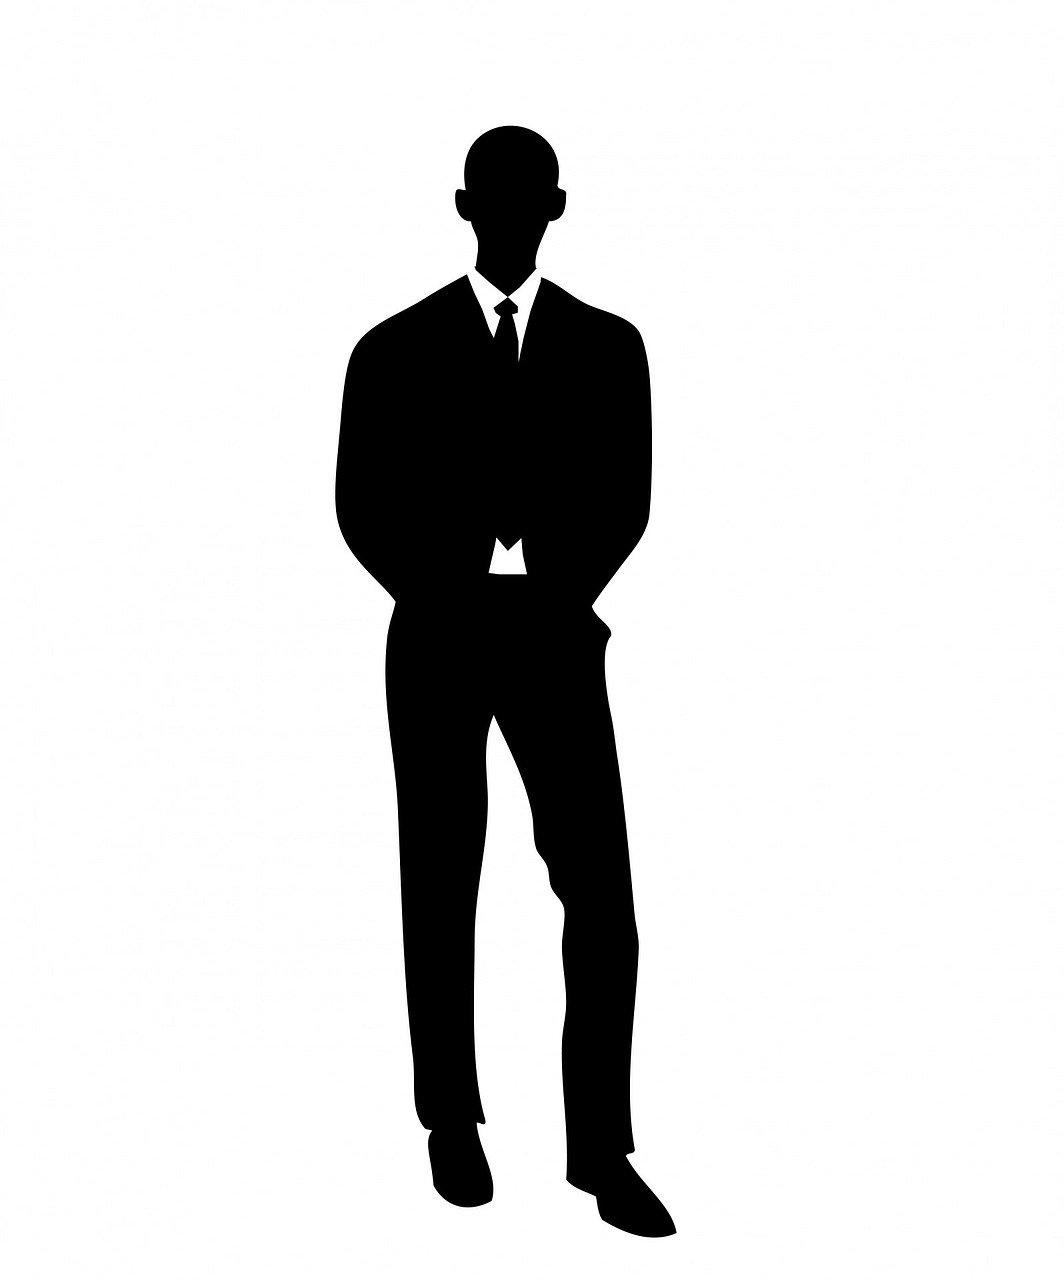 standing businessman silhouette cartoon royalty free - HD1596×1920